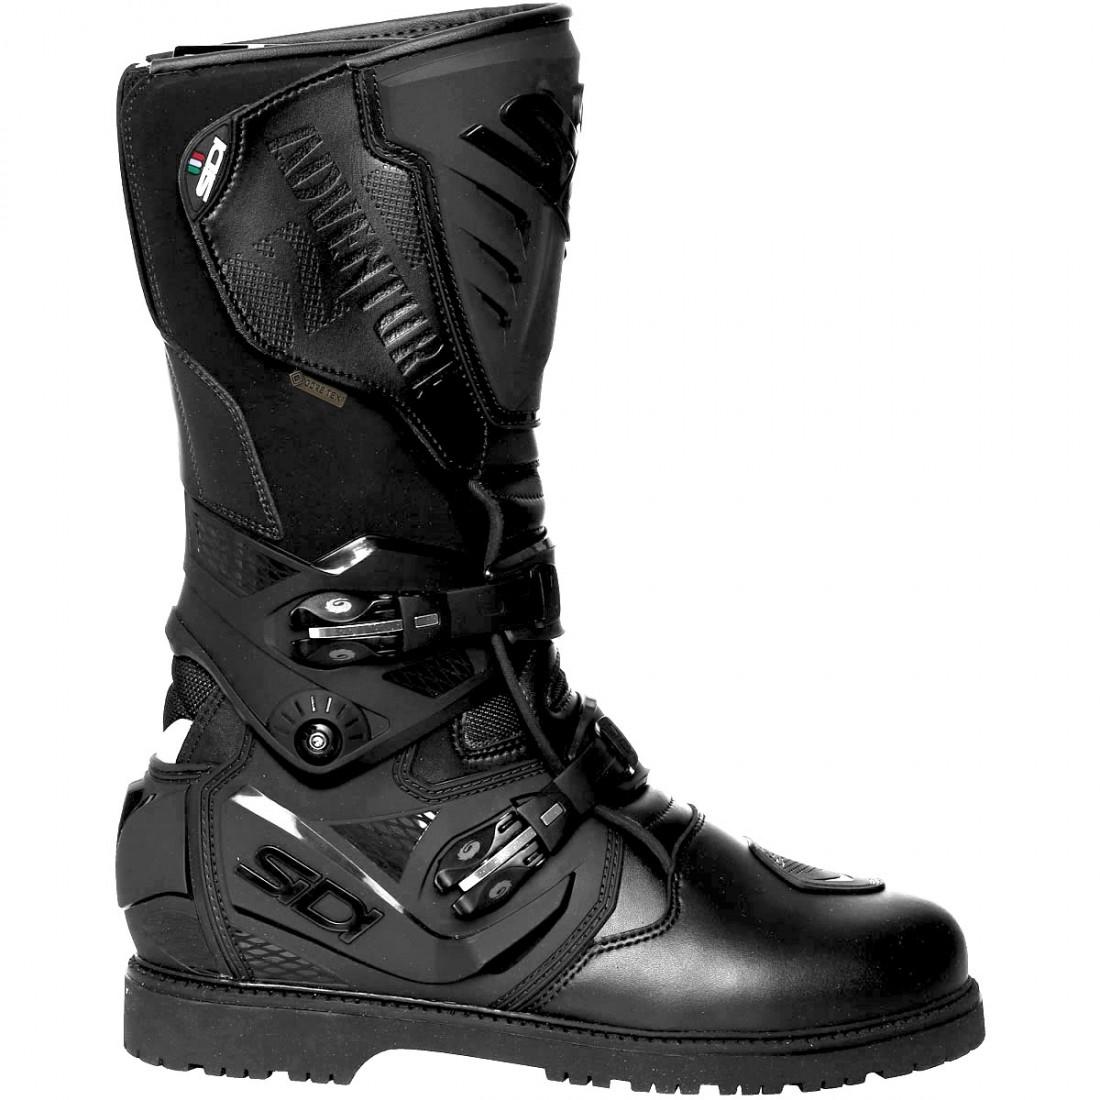 Gore Tex Bottes 2 Adventure Sidi Black 4ALj3R5q